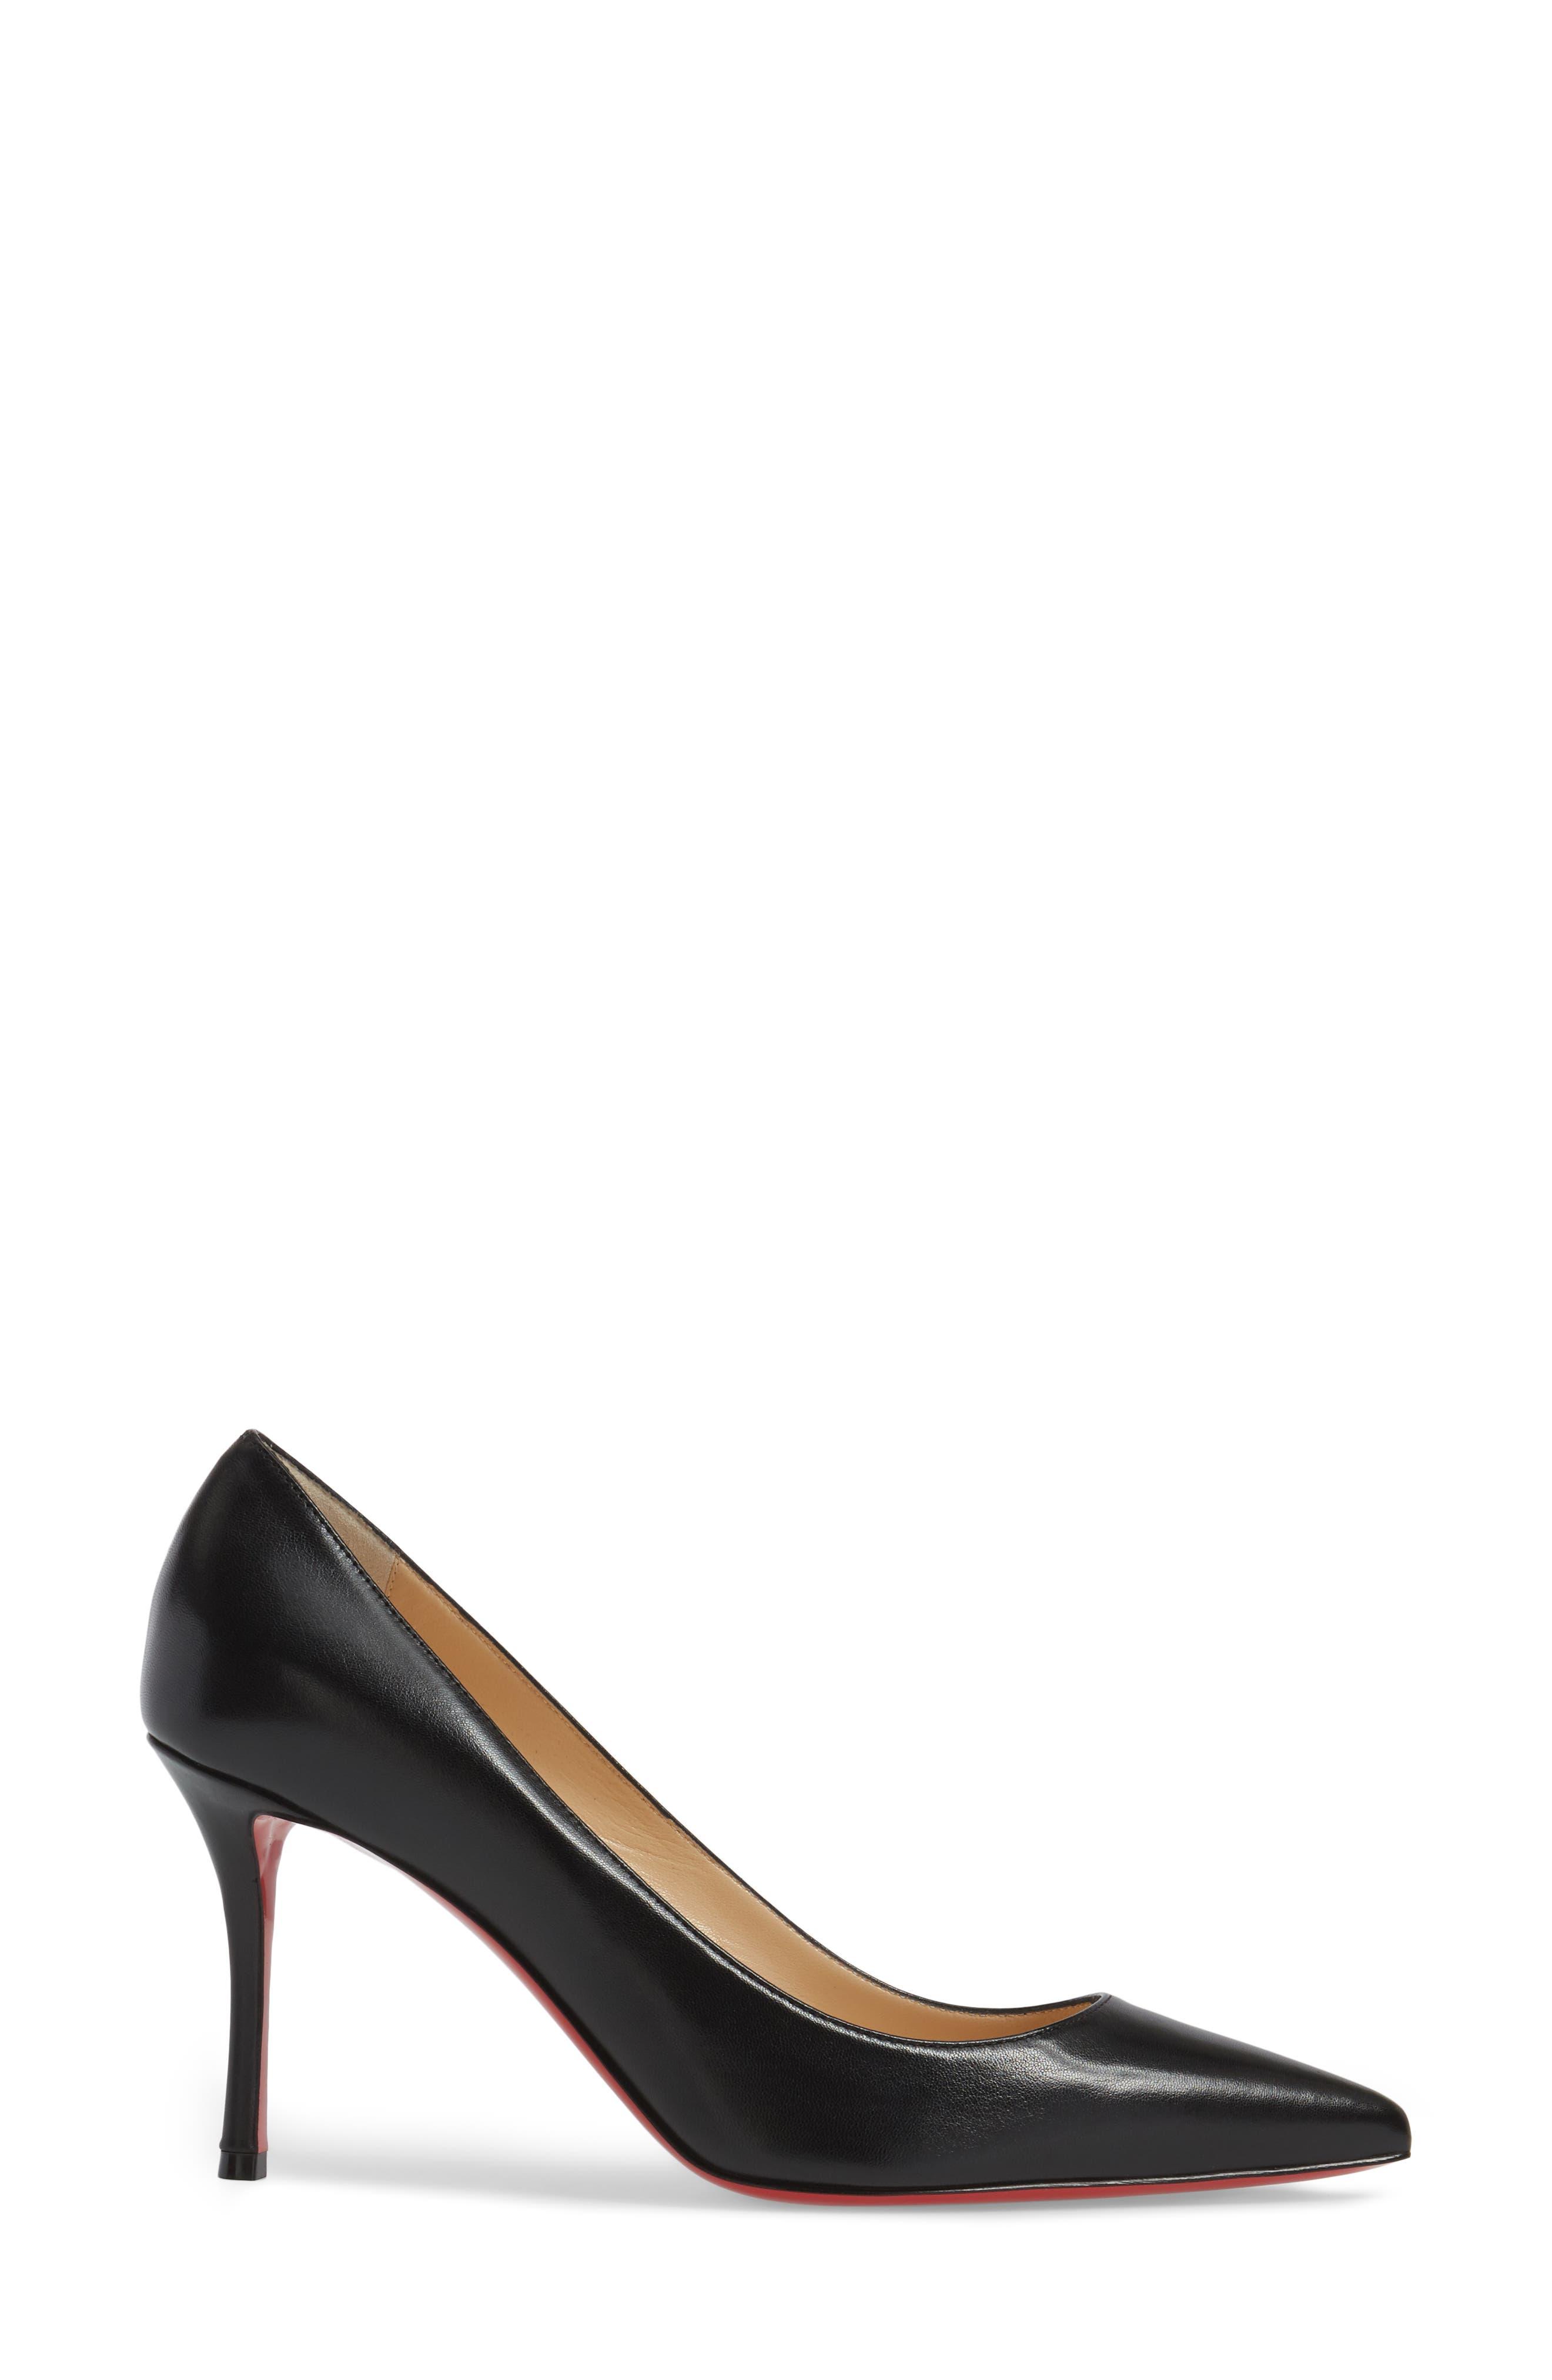 Alternate Image 3  - Christian Louboutin Decoltish Pointy Toe Pump (Women)